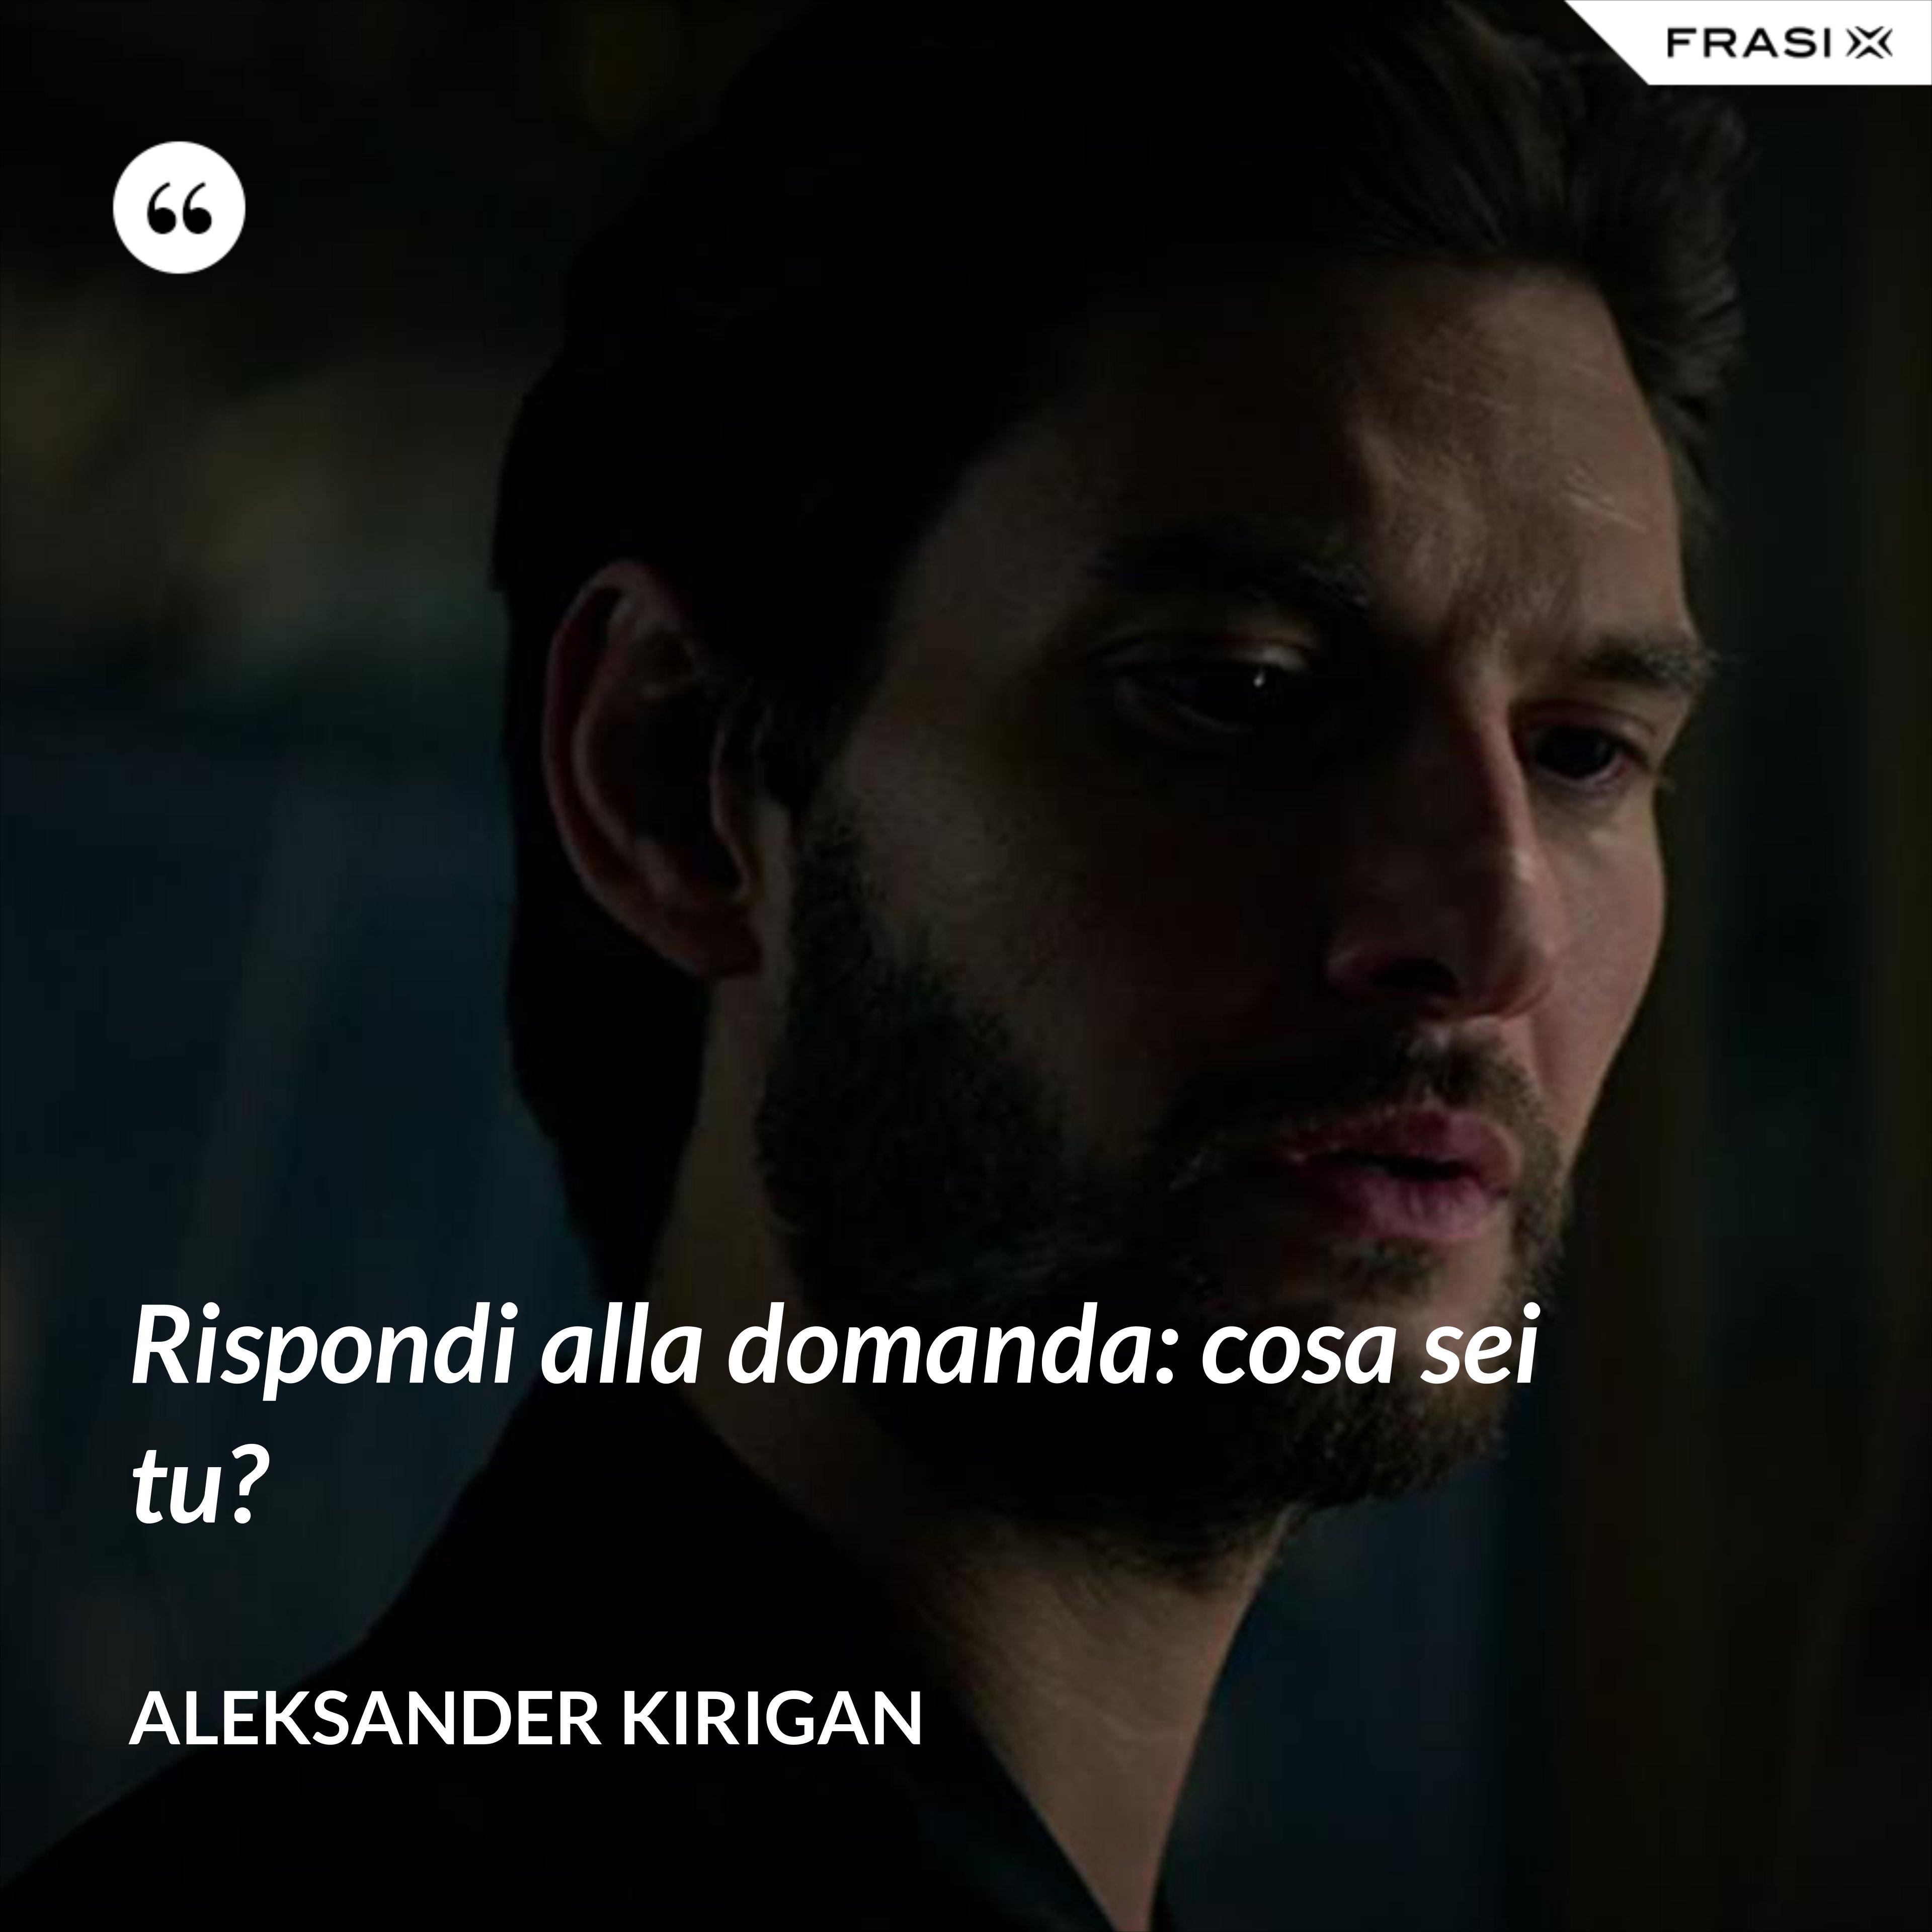 Rispondi alla domanda: cosa sei tu? - Aleksander Kirigan